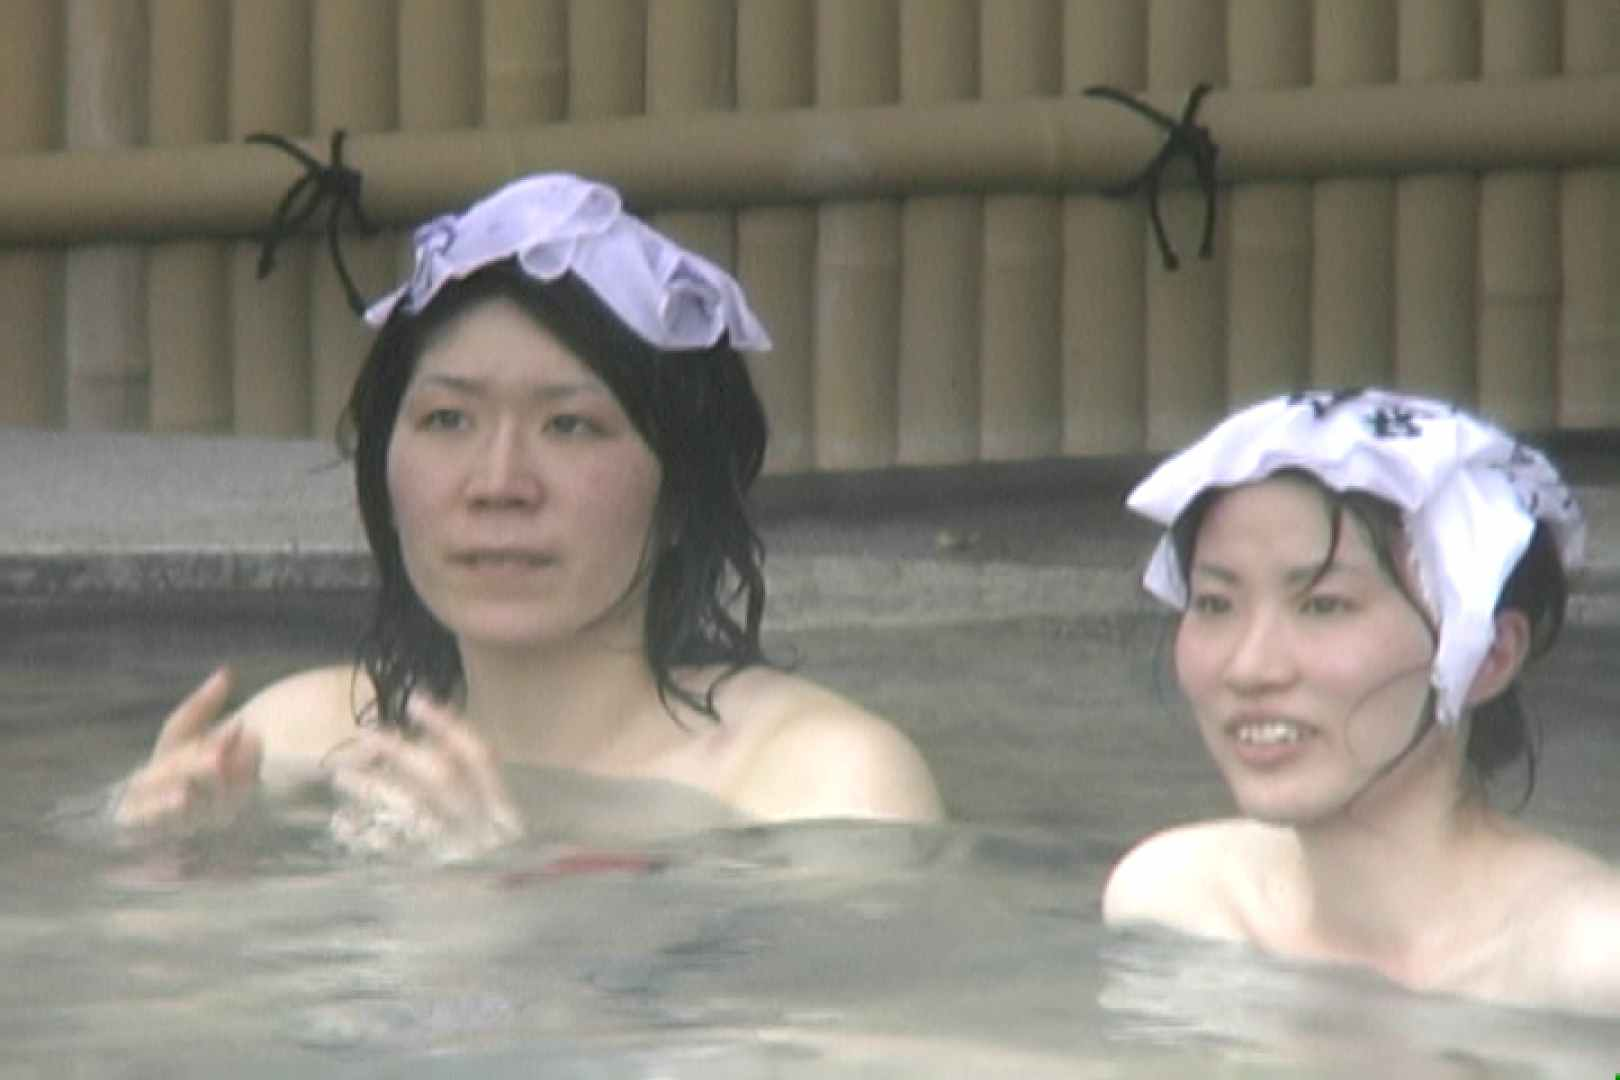 高画質露天女風呂観察 vol.013 女風呂の中は・・   高画質  10枚 1